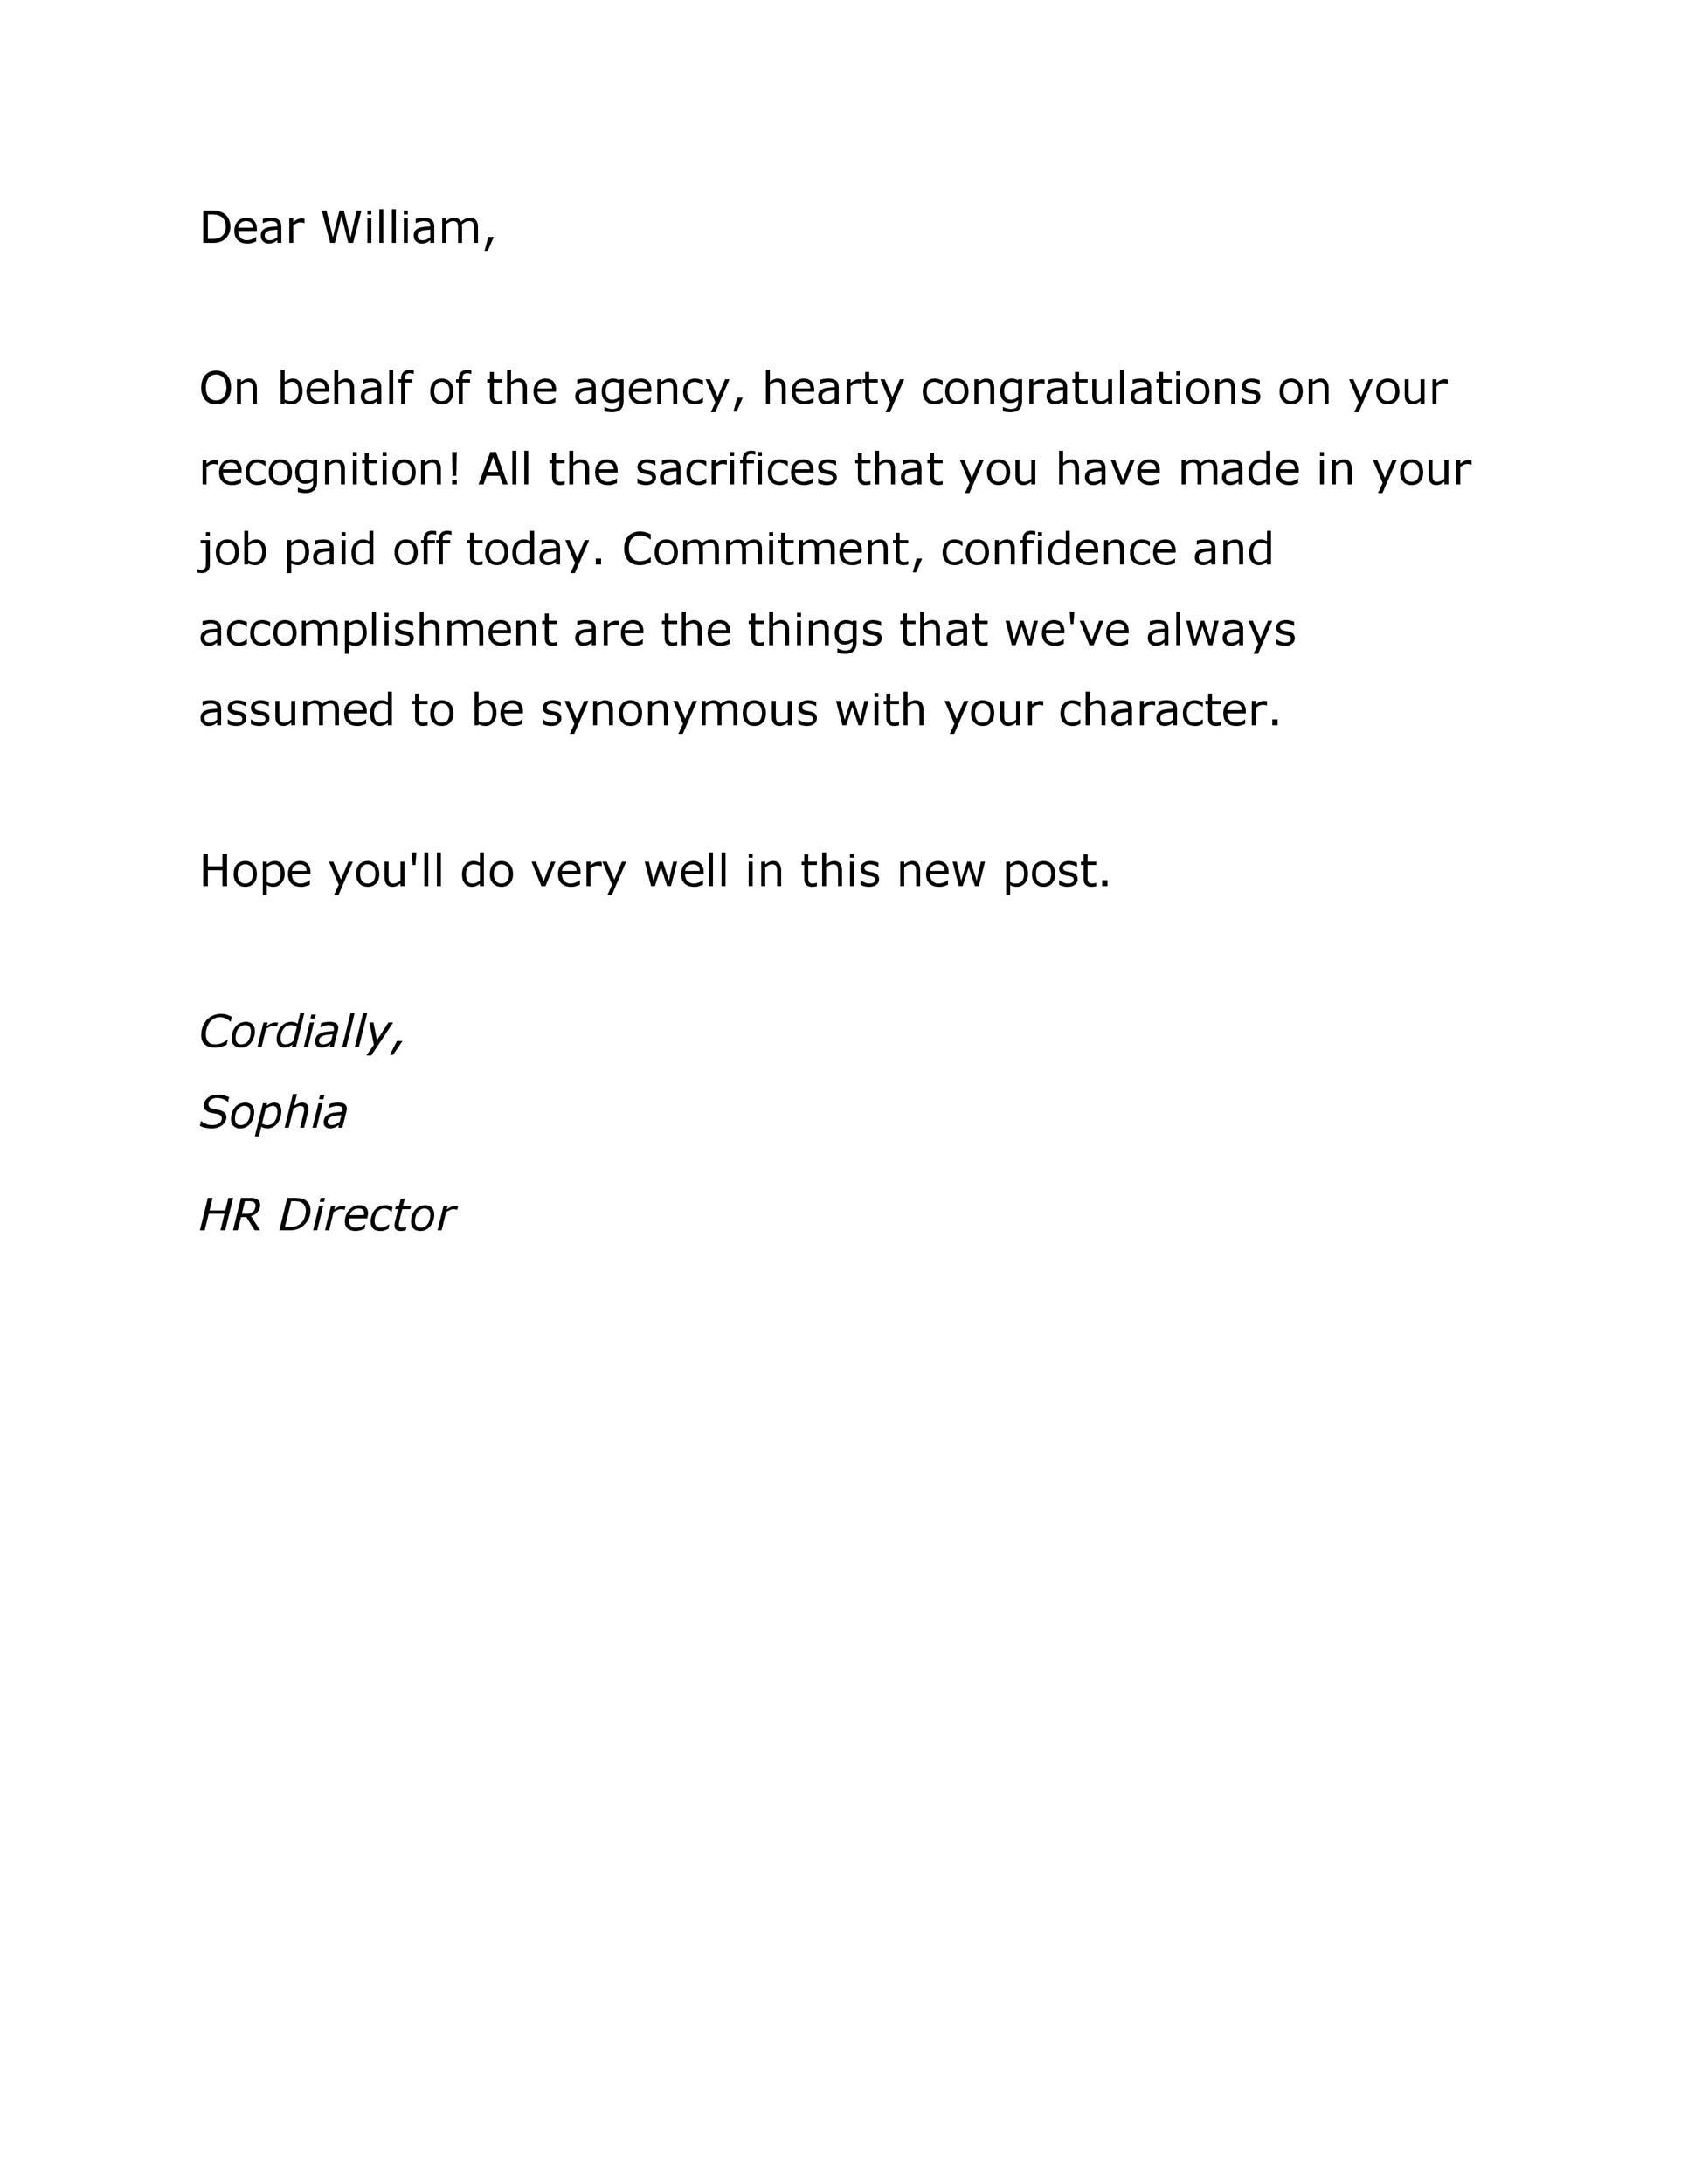 Free promotion letter 40